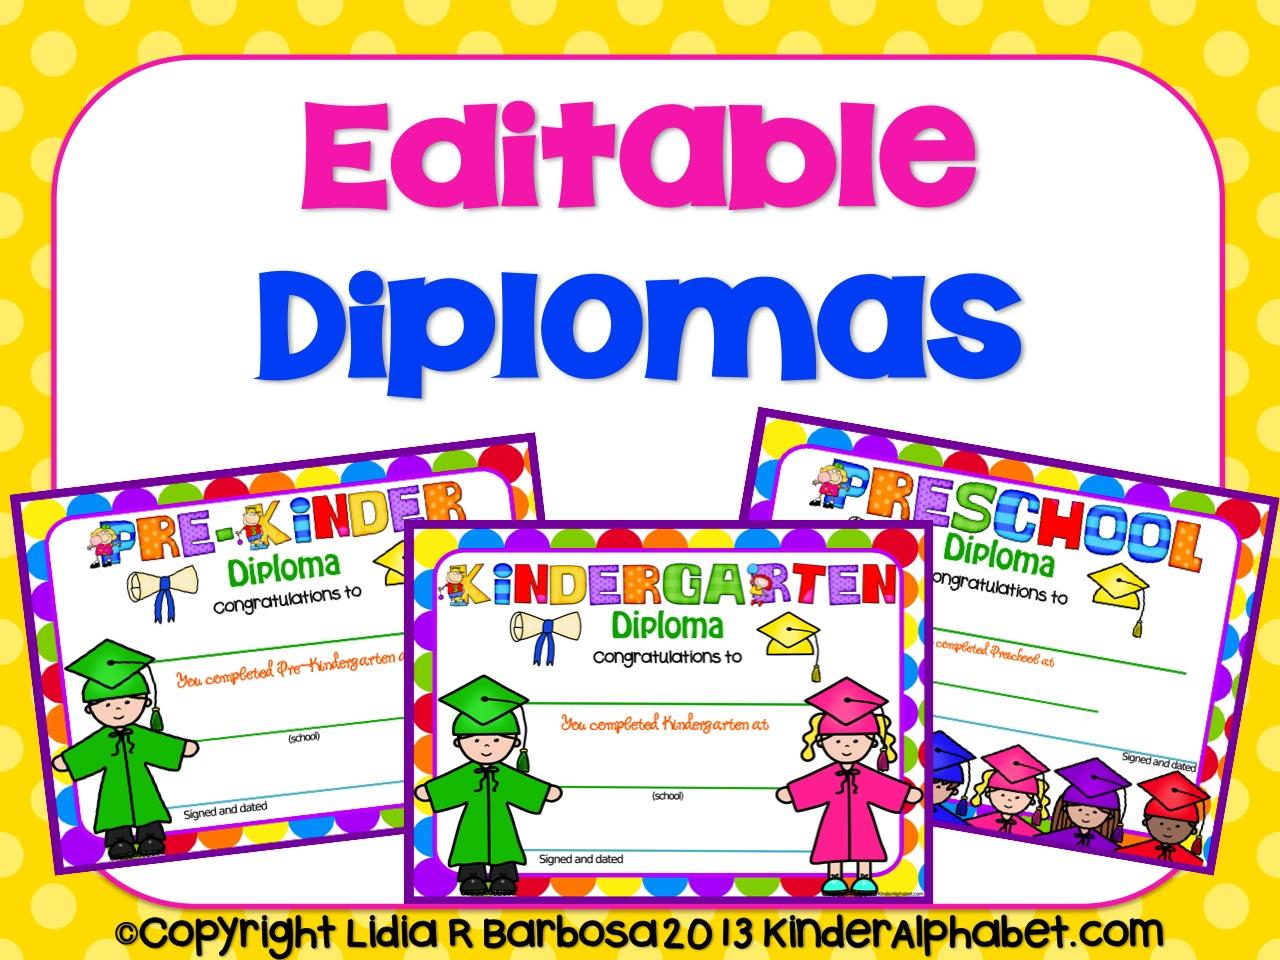 Preschool certificates templates free pasoevolist preschool certificates templates free yadclub Gallery